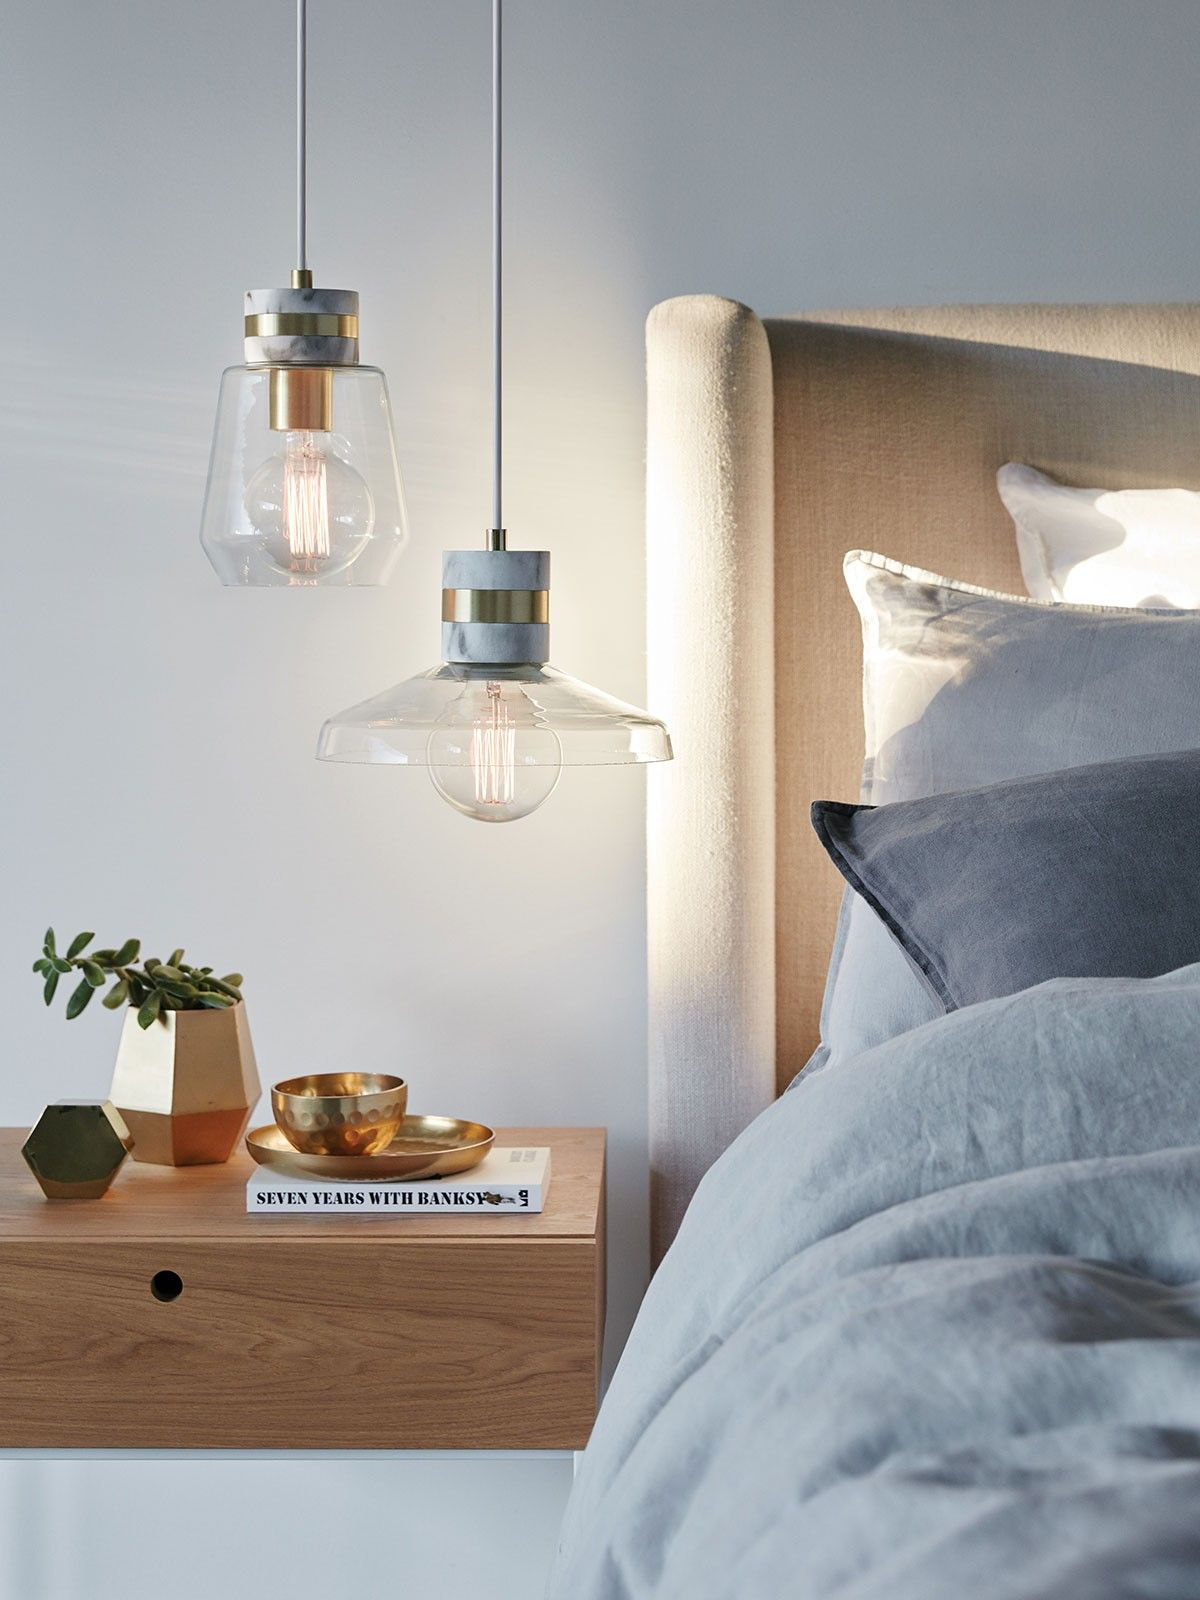 pin by biubiu mogu on bedside pendant lighting bedroom kitchen rh pinterest com